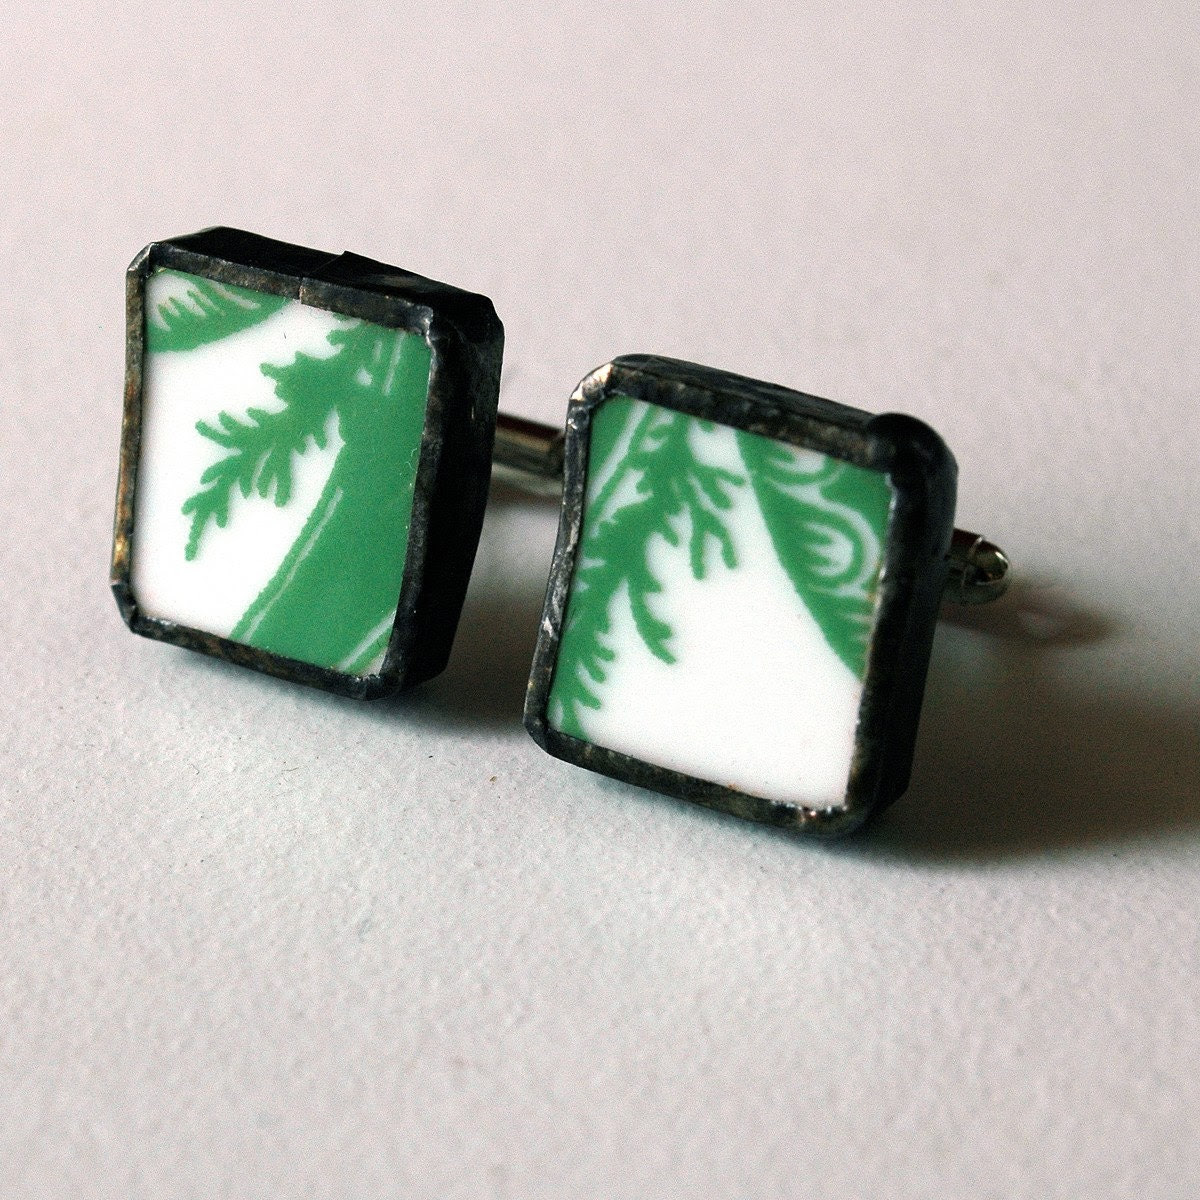 Green and white Broken Plate CuffLinks